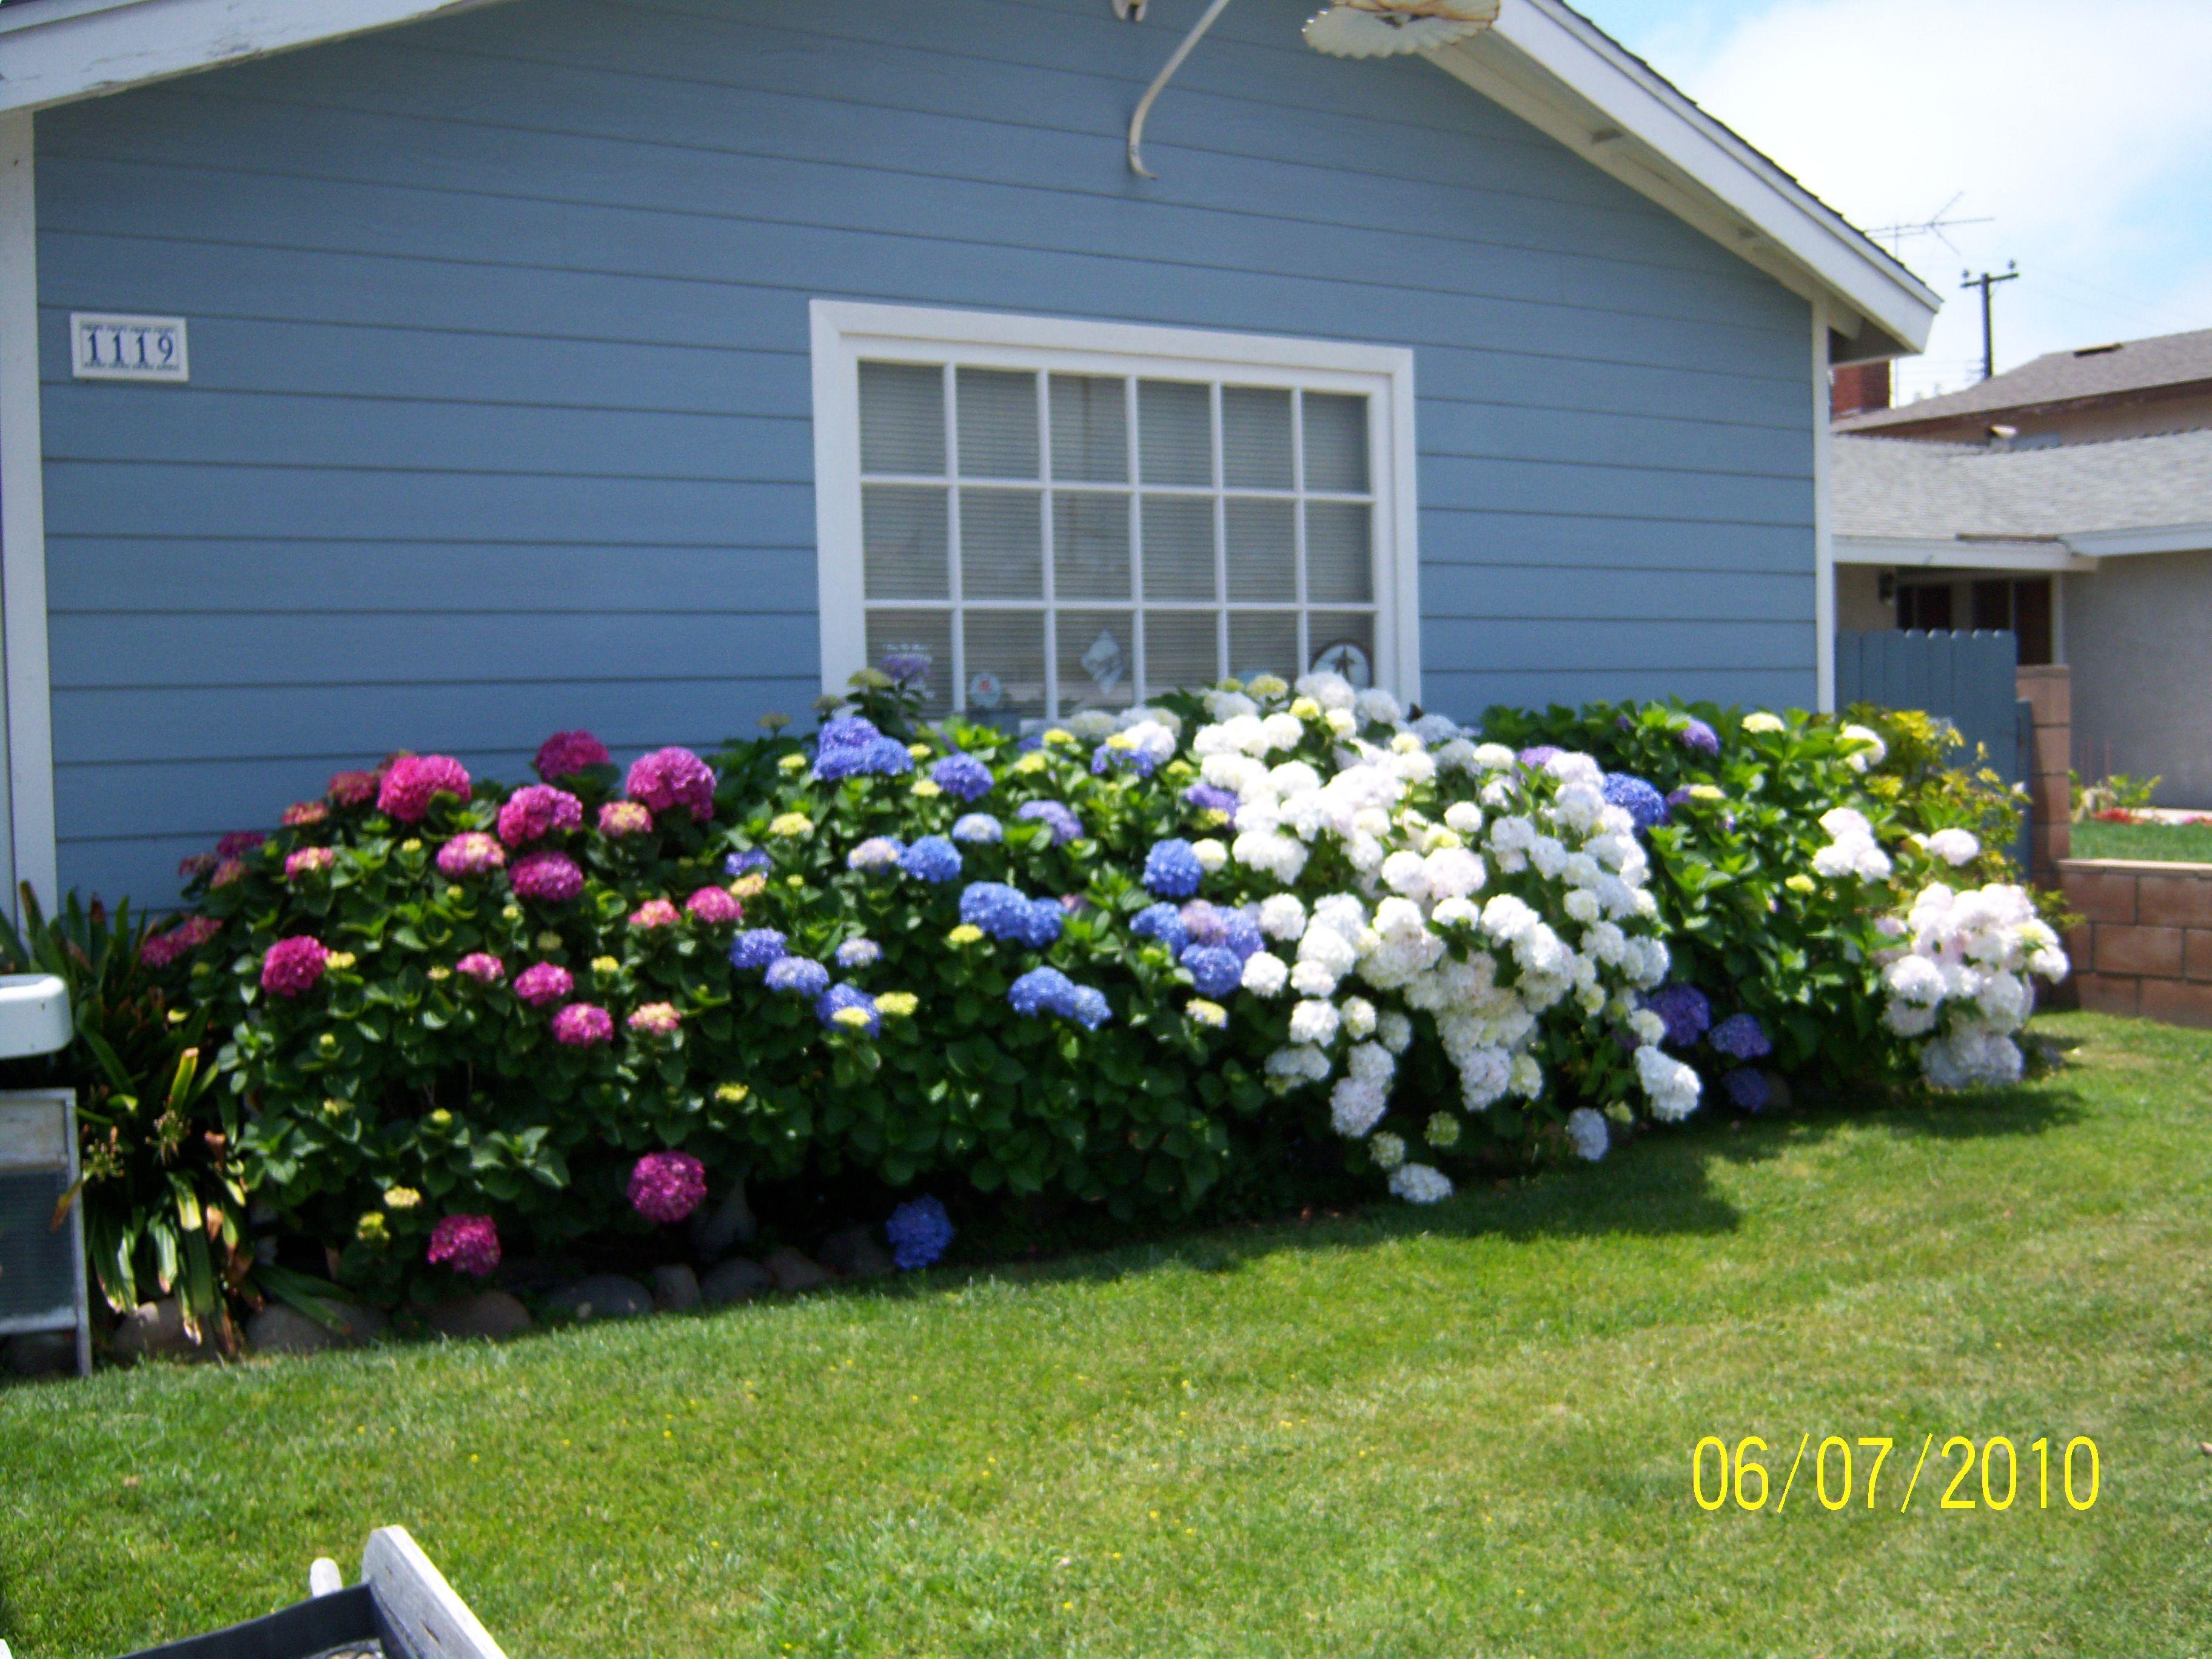 Someday I Want Huge Hydrangea Bushes Next To My House